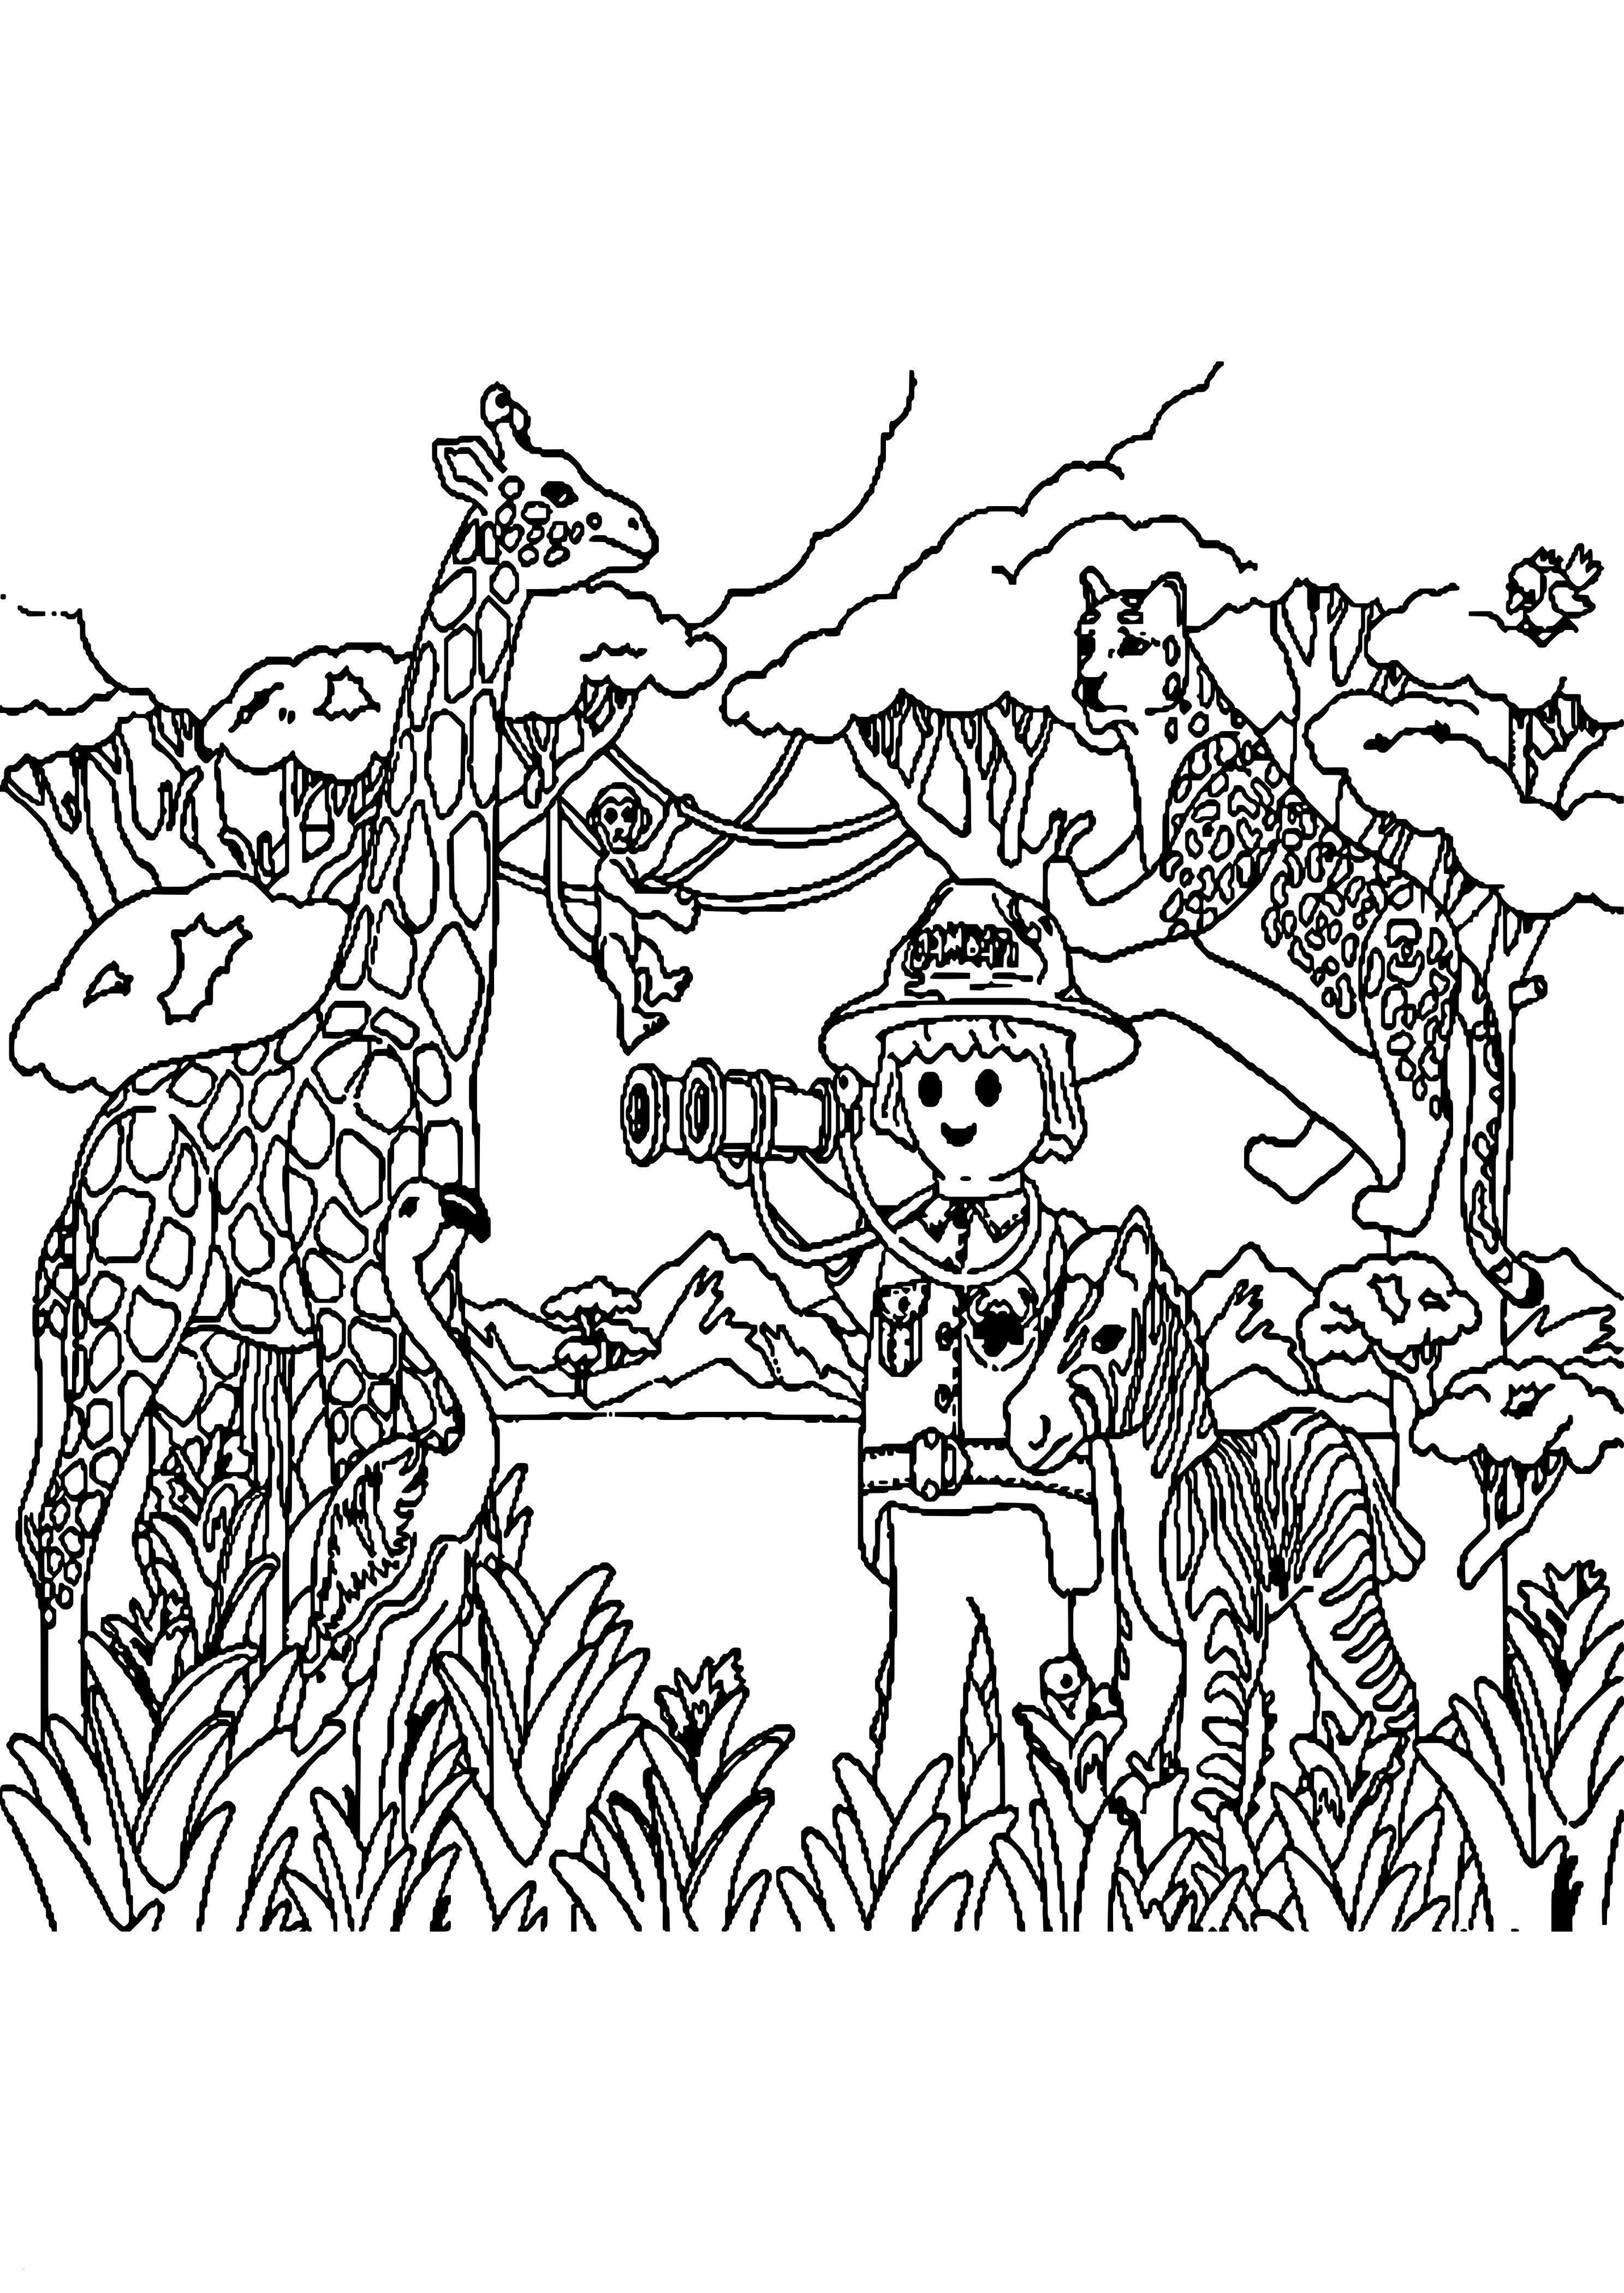 frisch malvorlagen jaguar tiere  pencil drawings